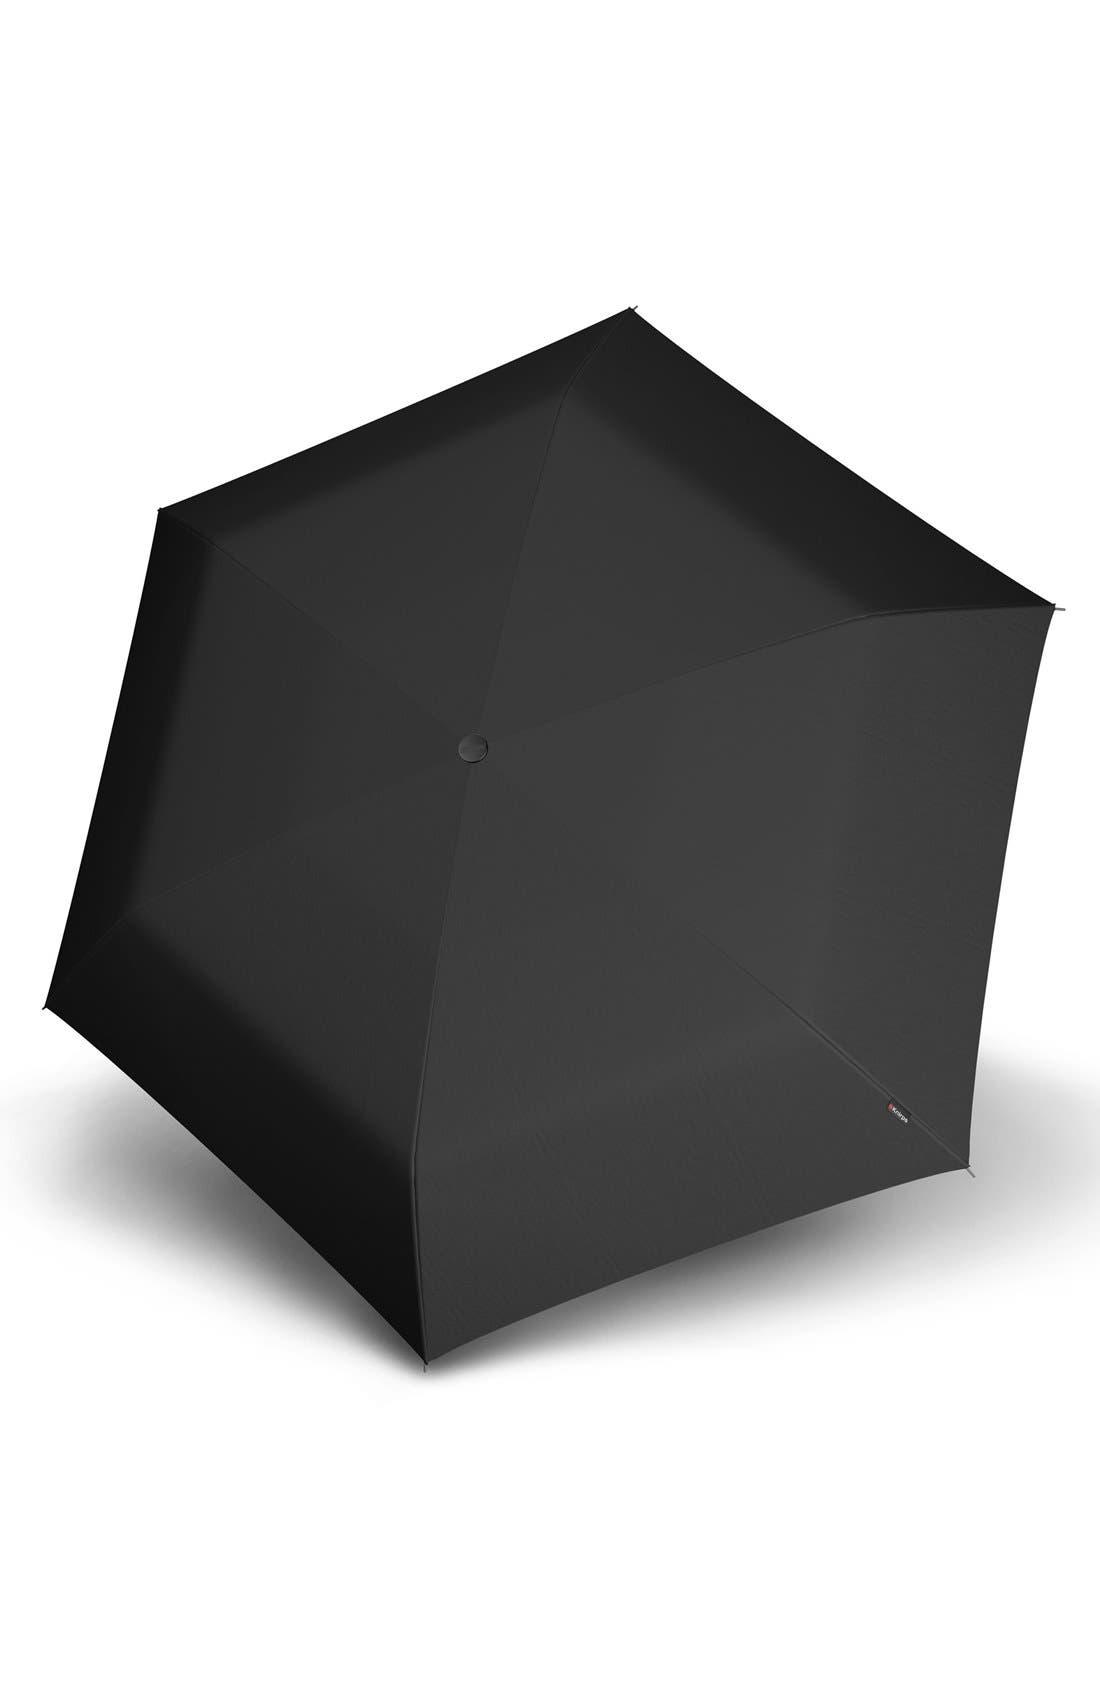 'Flat Duomatic' Umbrella,                             Main thumbnail 1, color,                             Black